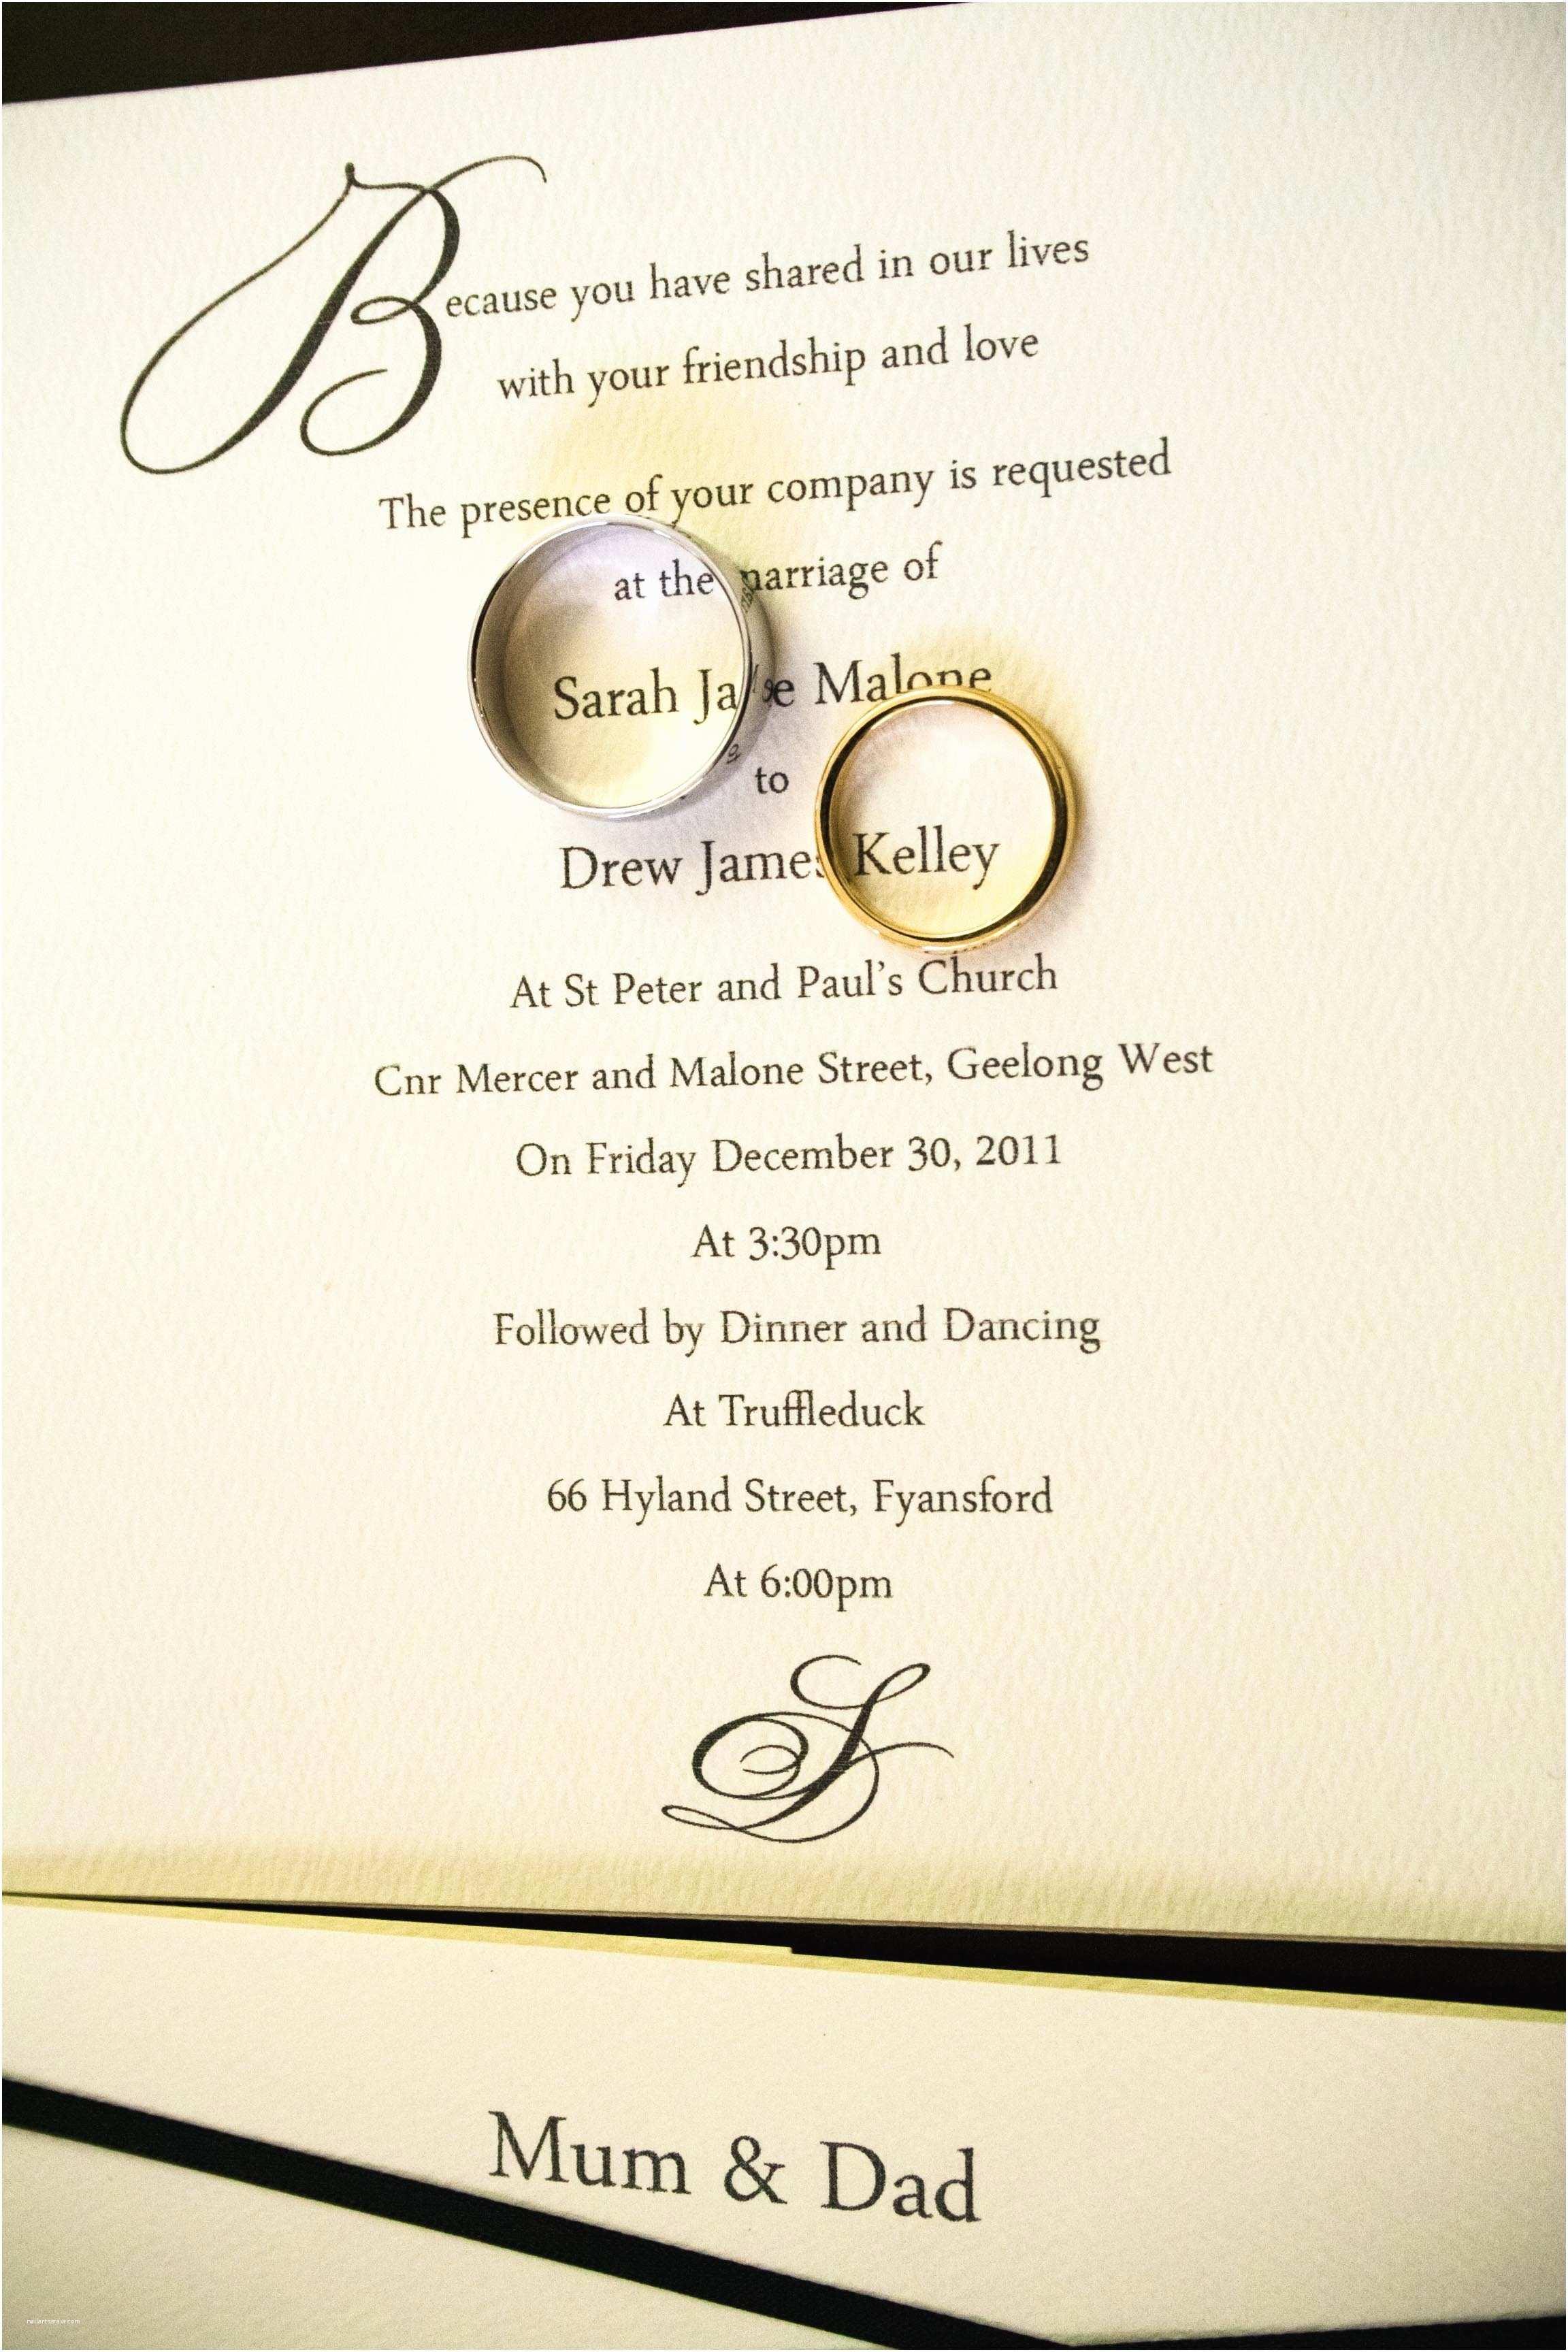 Email Wedding Invitations Free Wedding E Invitations Free Smart Design Email Wedding